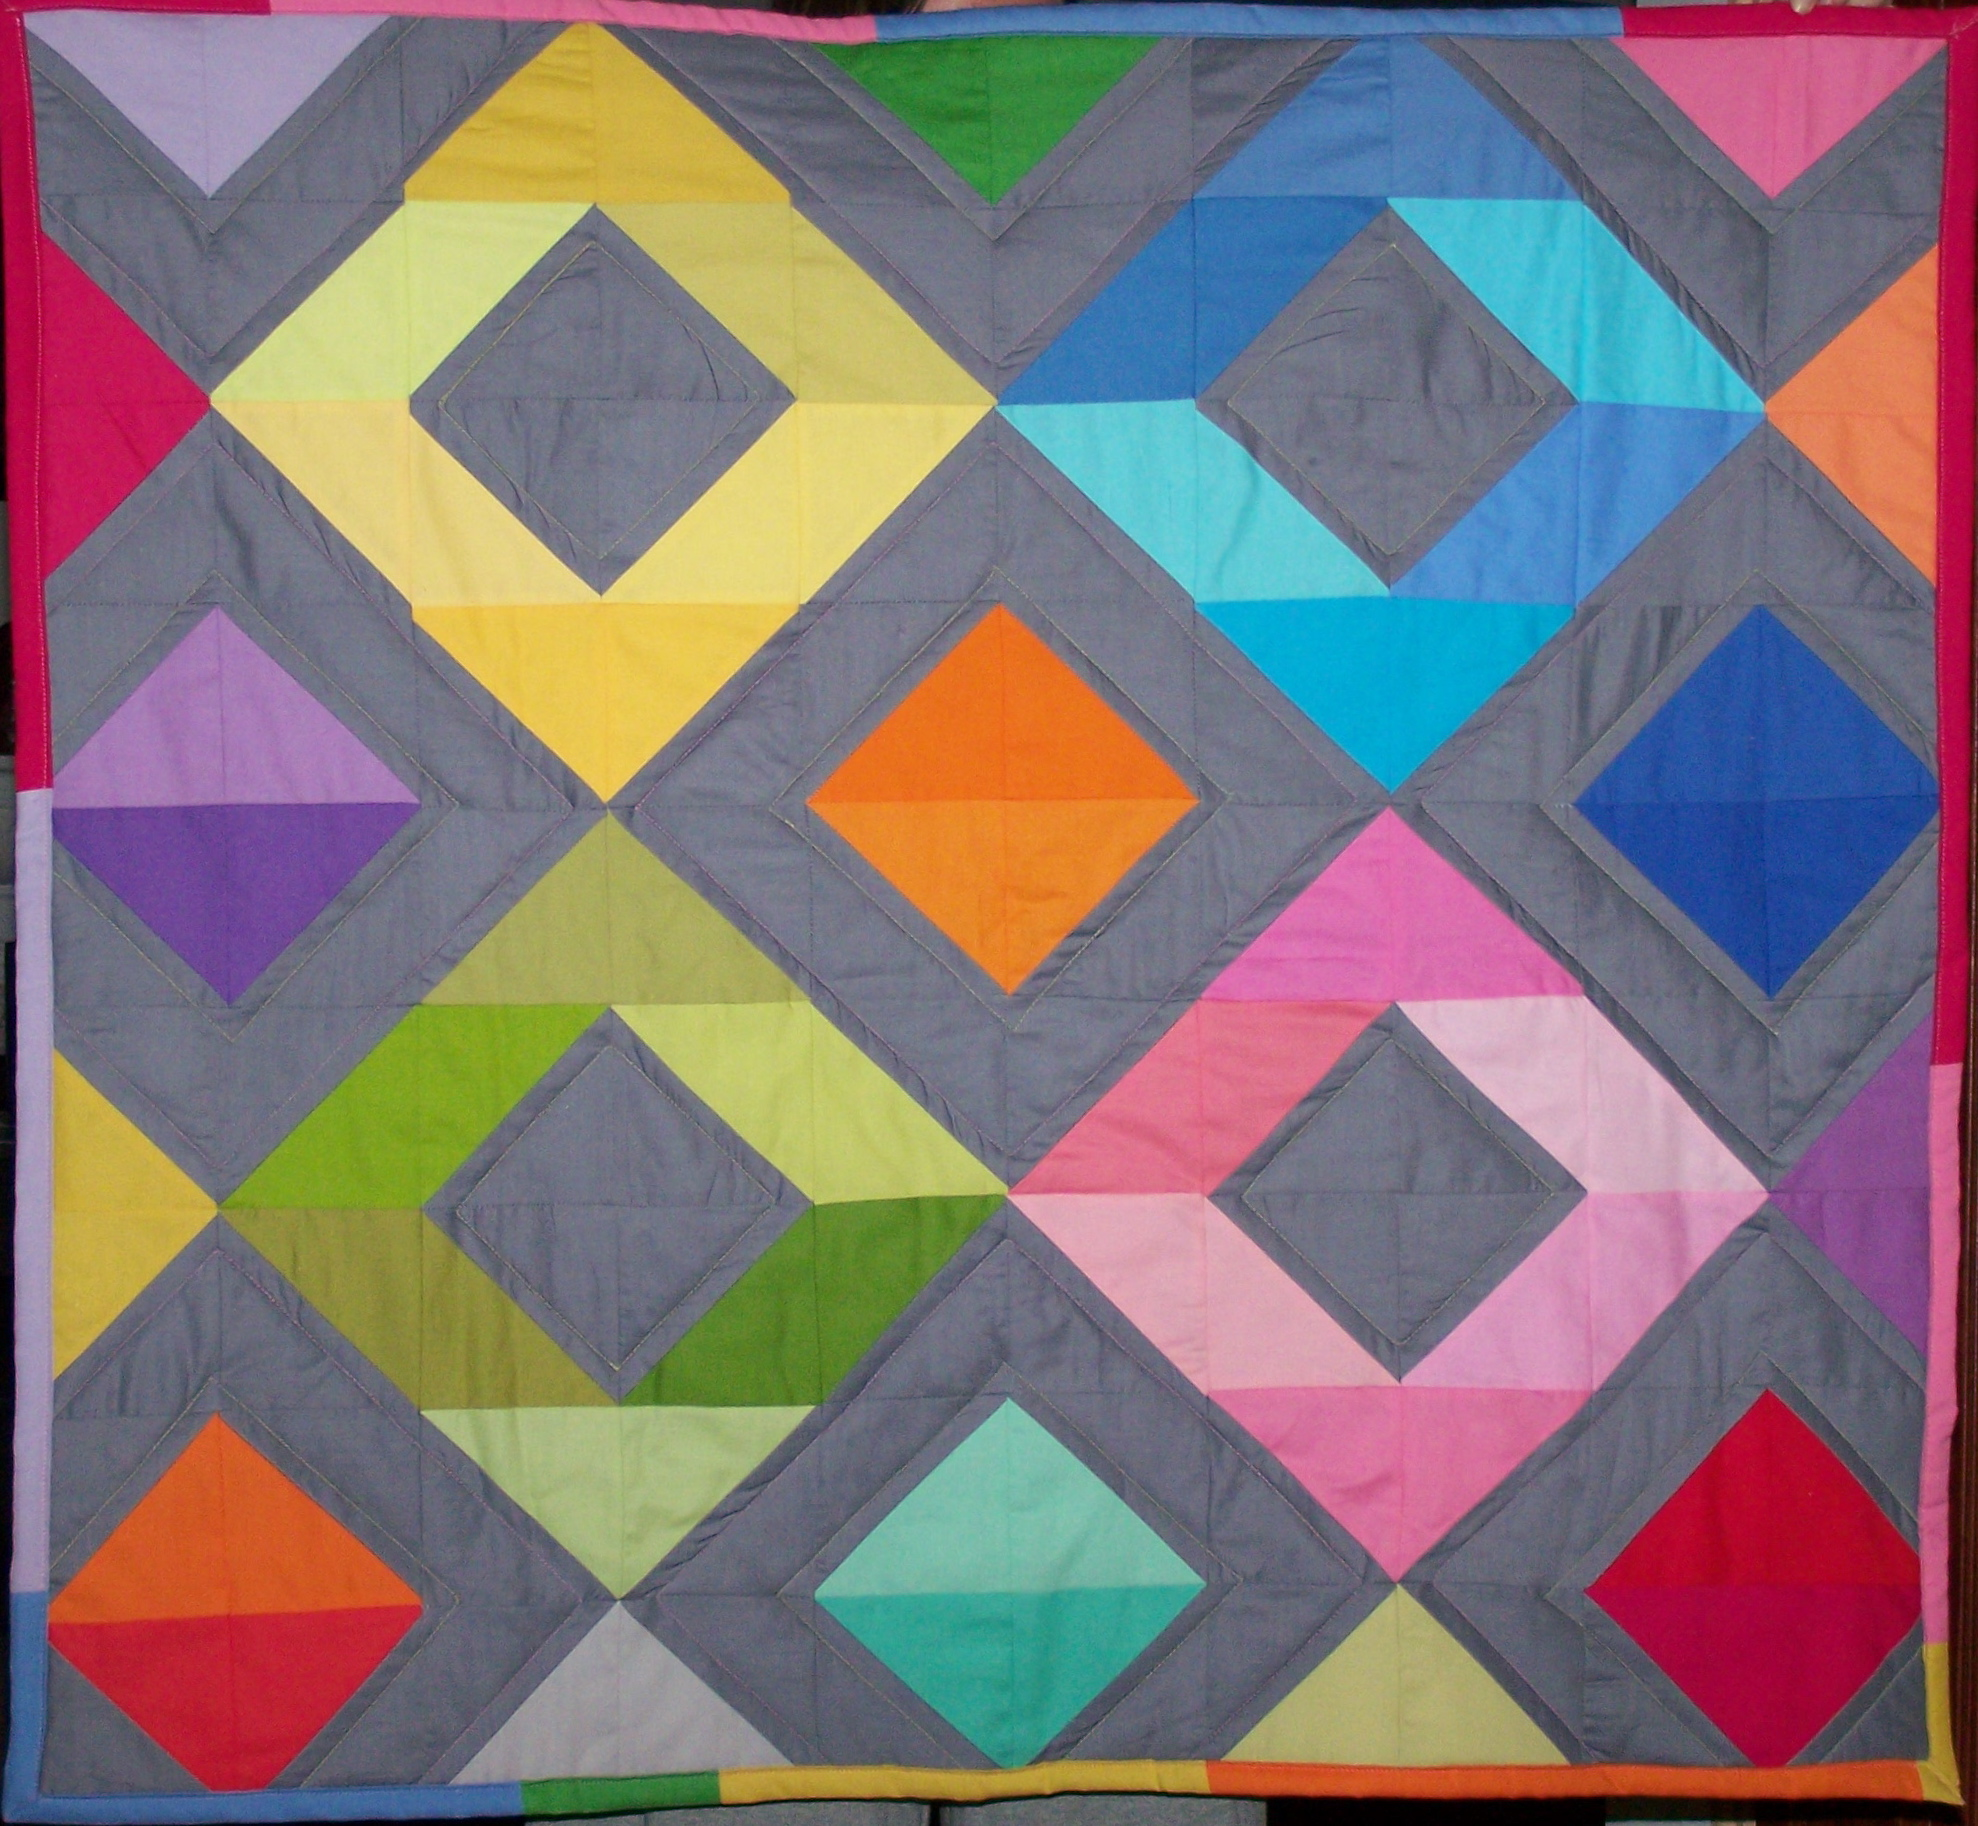 Rainbow Diamonds Mini Quilt Tutorial | Craft Buds